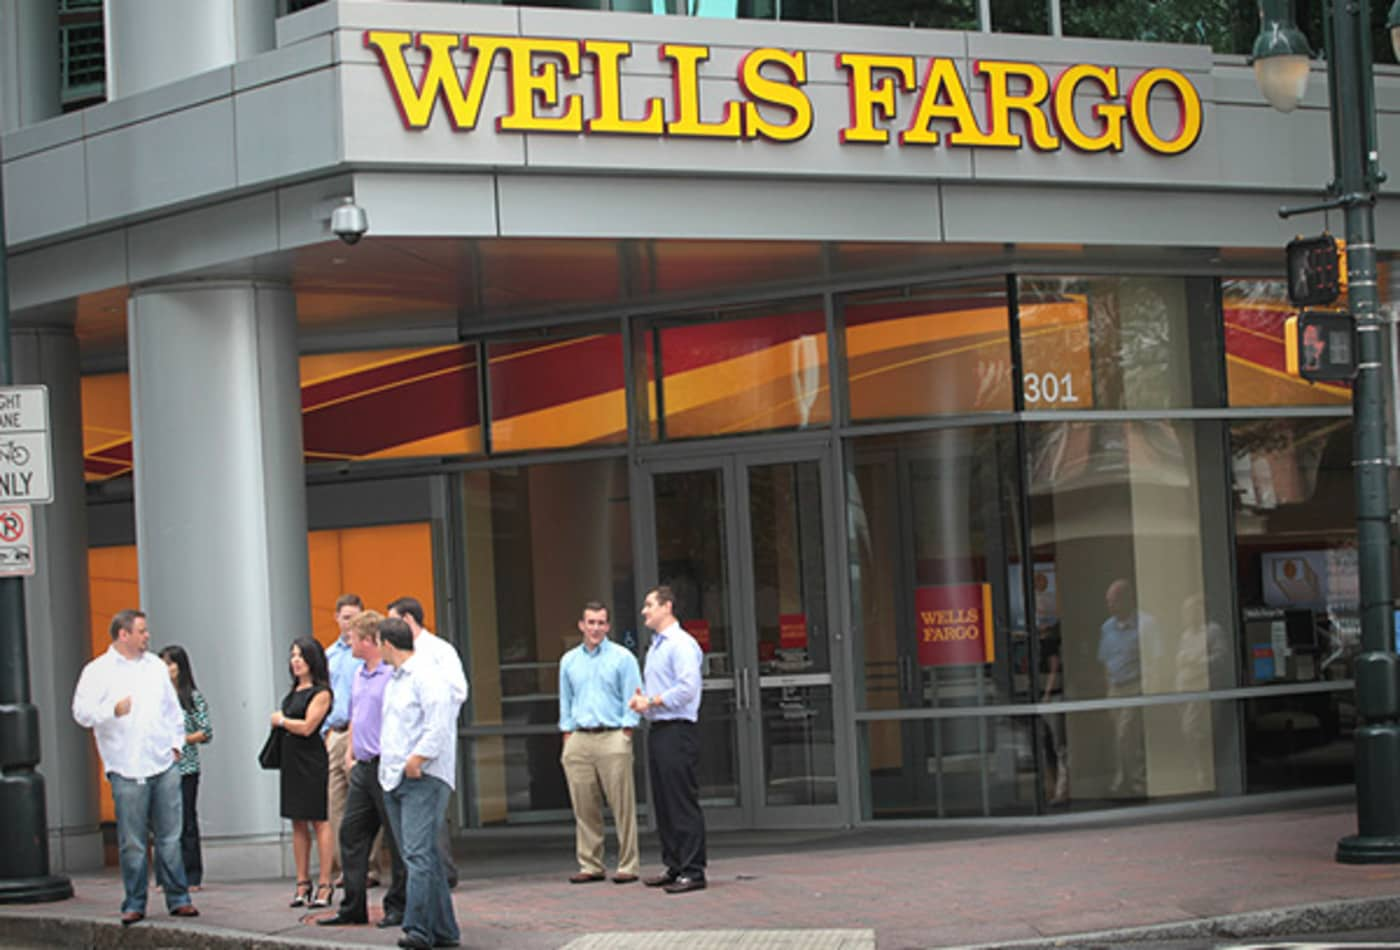 48899460 Most-Widely-Held-Stocks-wells-fargo.jpg